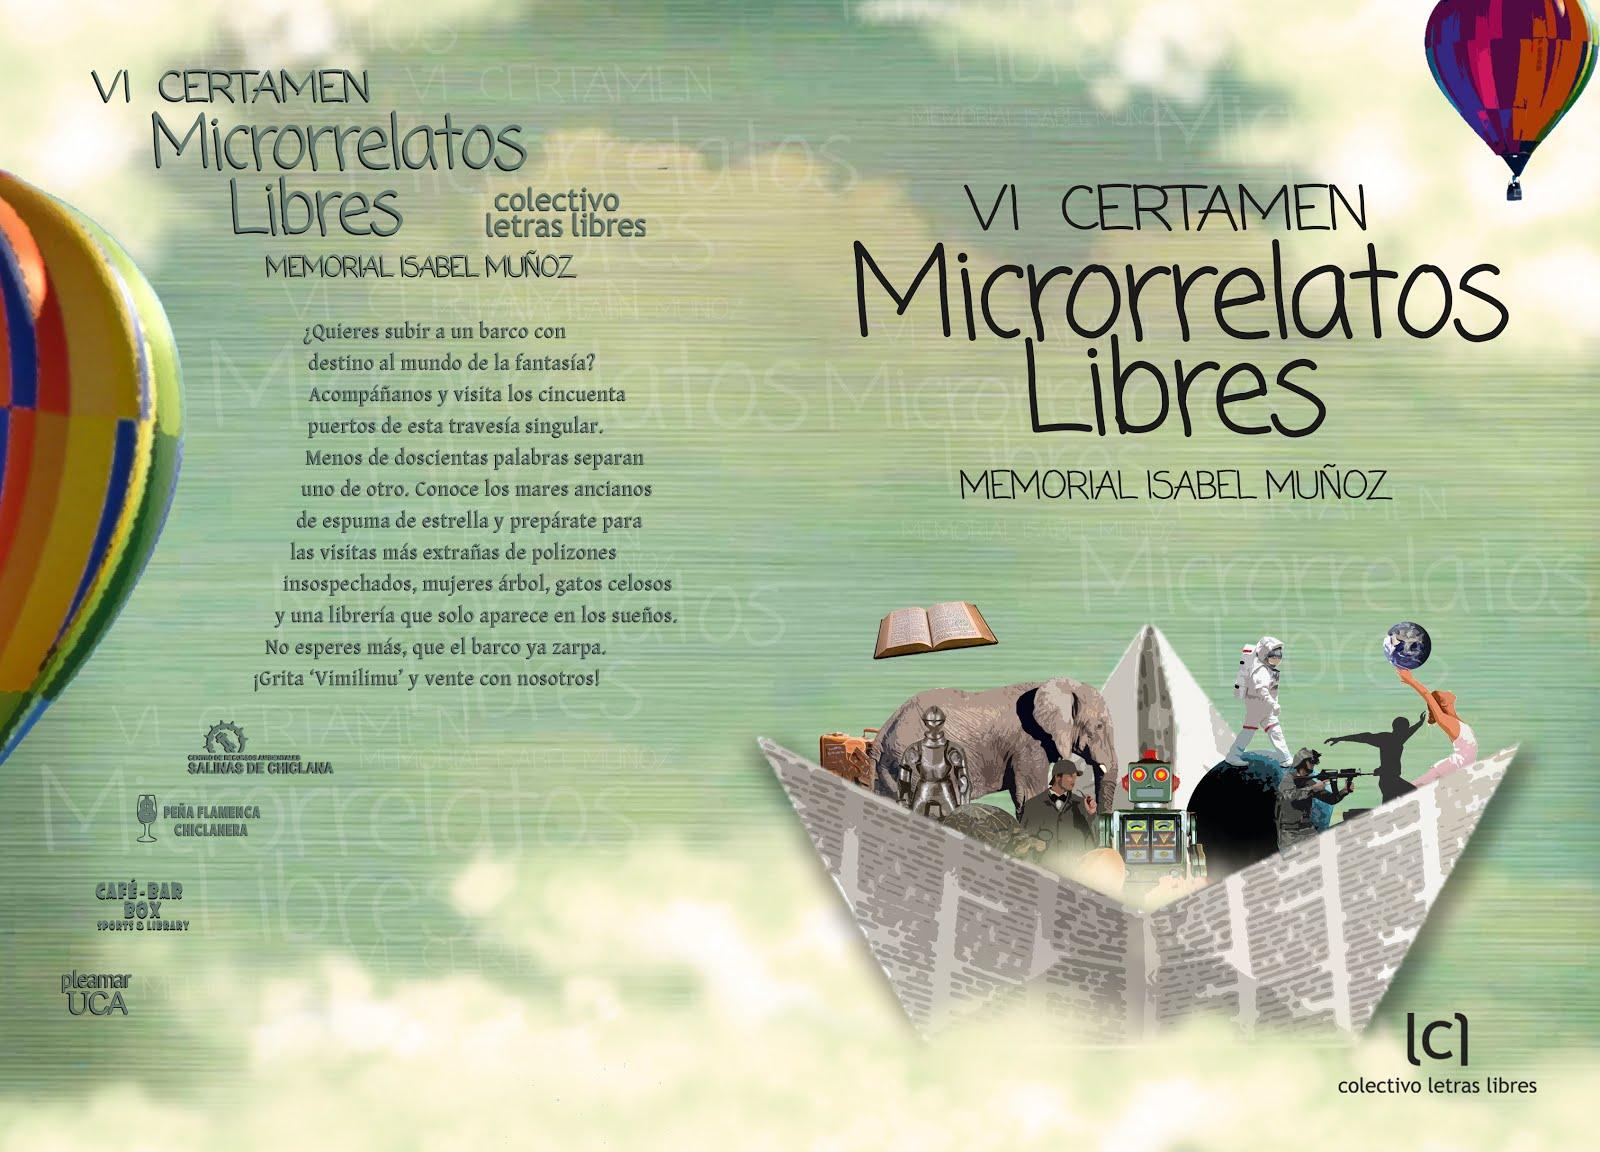 VI Certamen Microrrelatos Libres